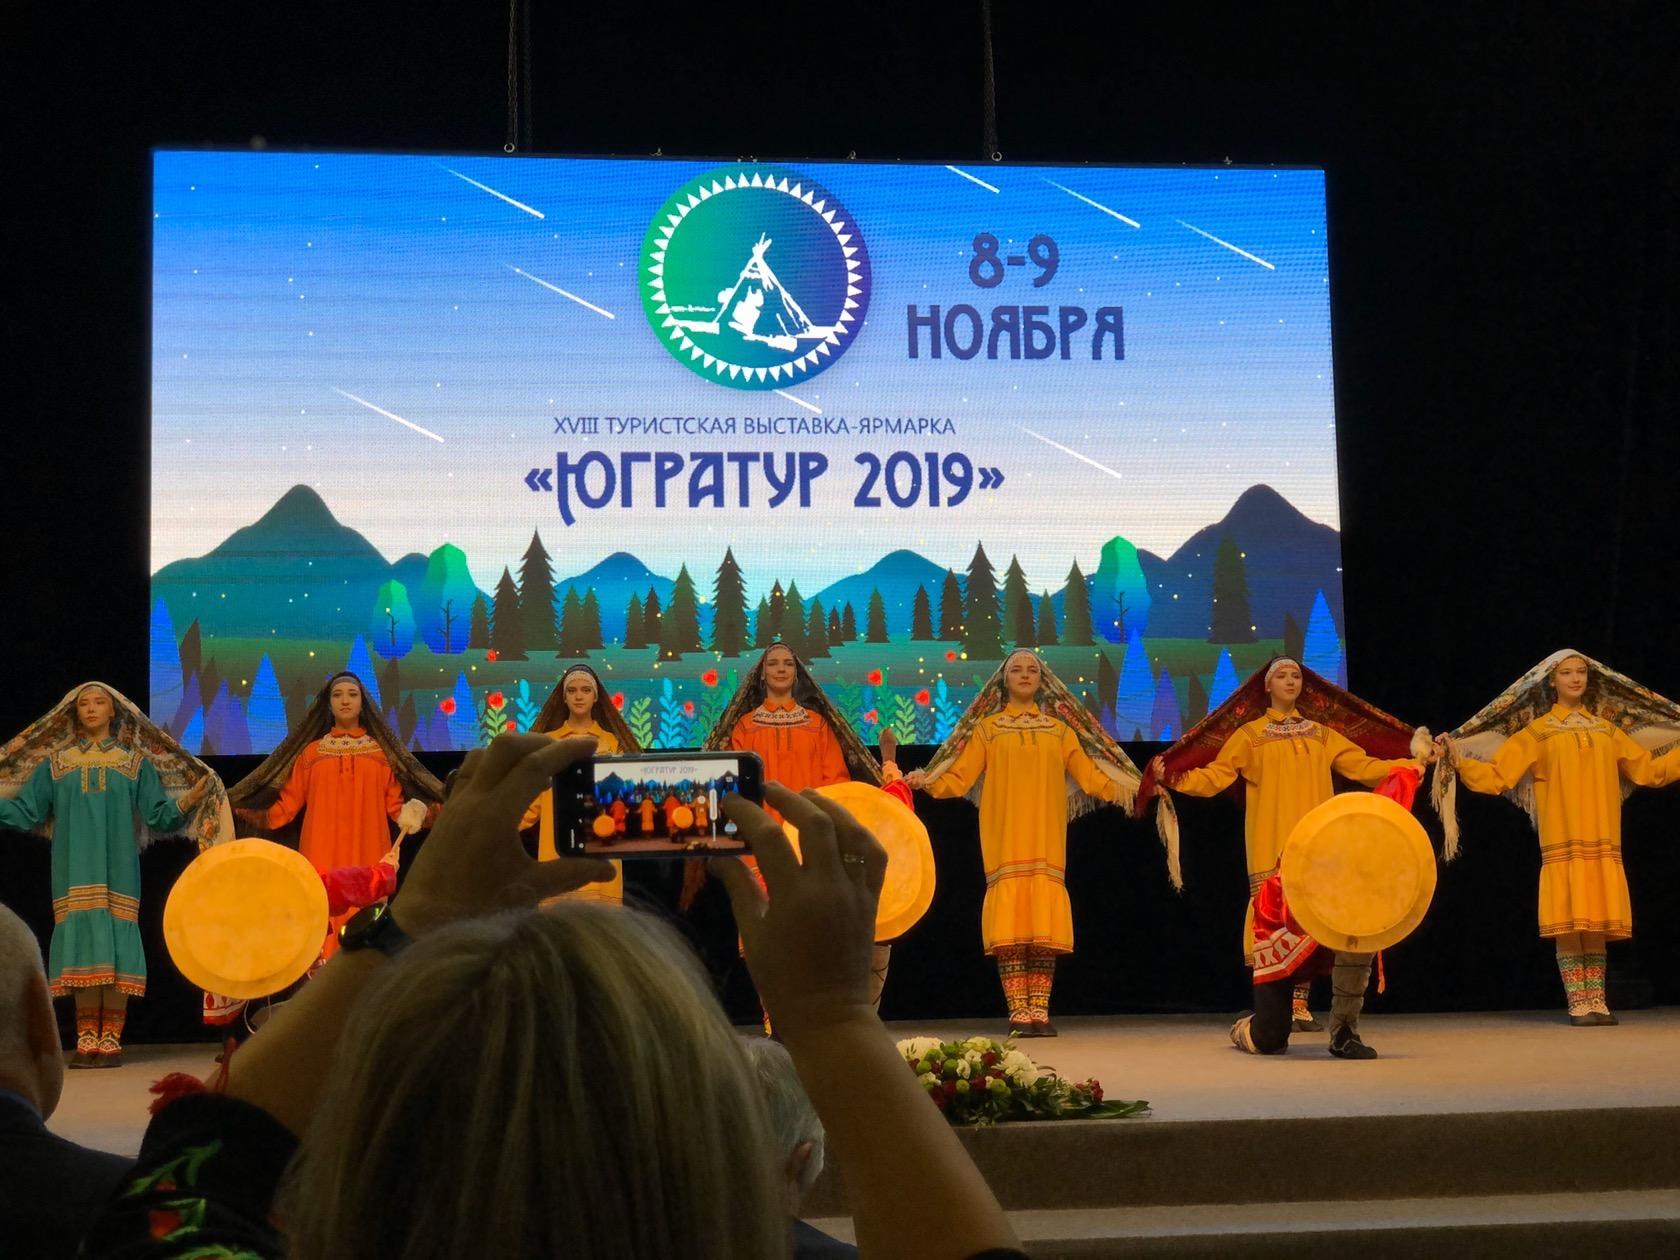 Окружная XVIII туристская выставка-ярмарка ЮГРАТУР 2019